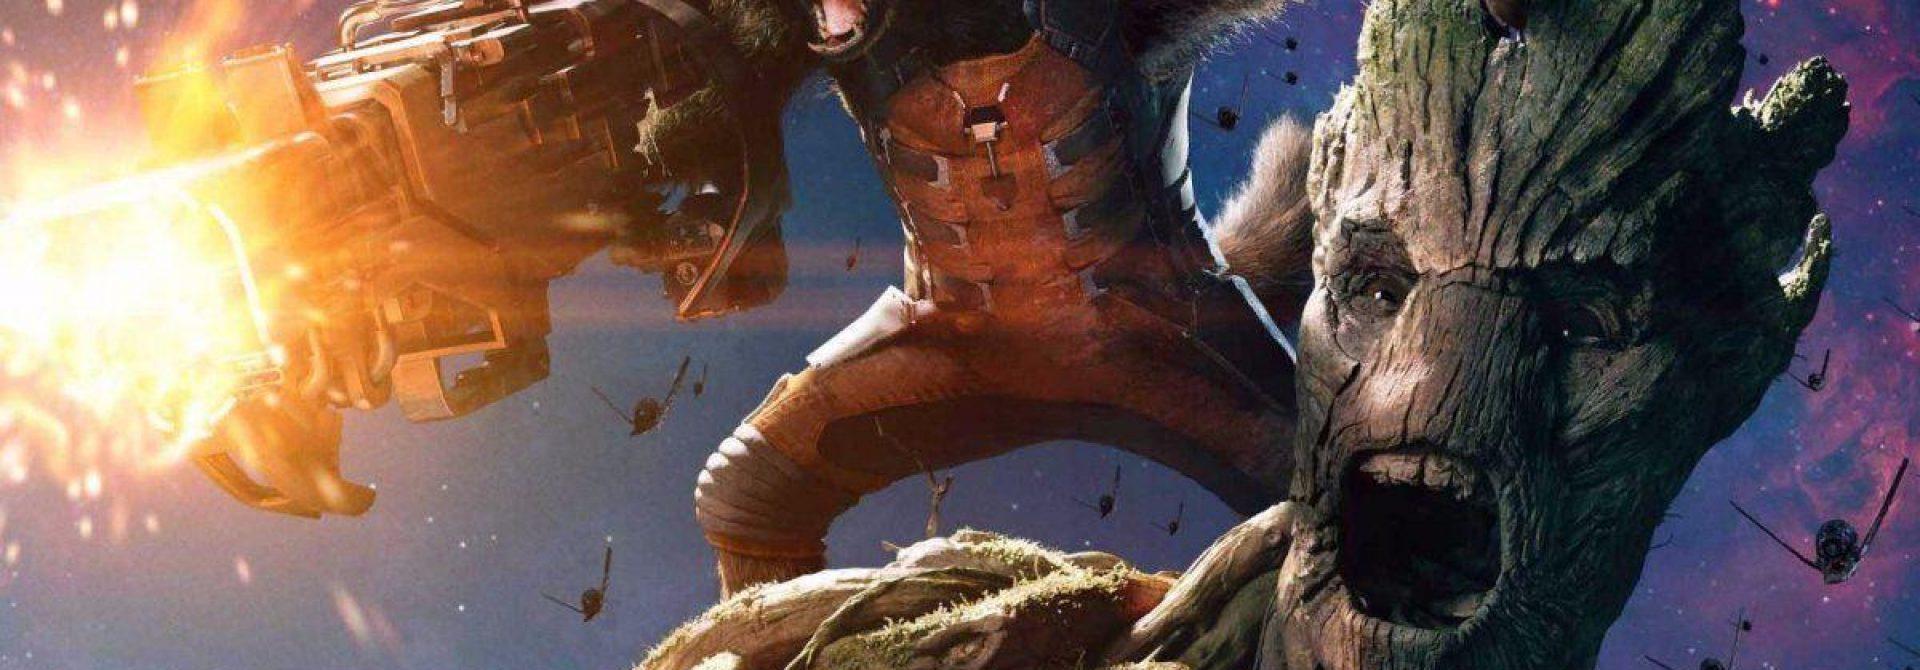 Rocket and Groot Influenced Dr. Strange